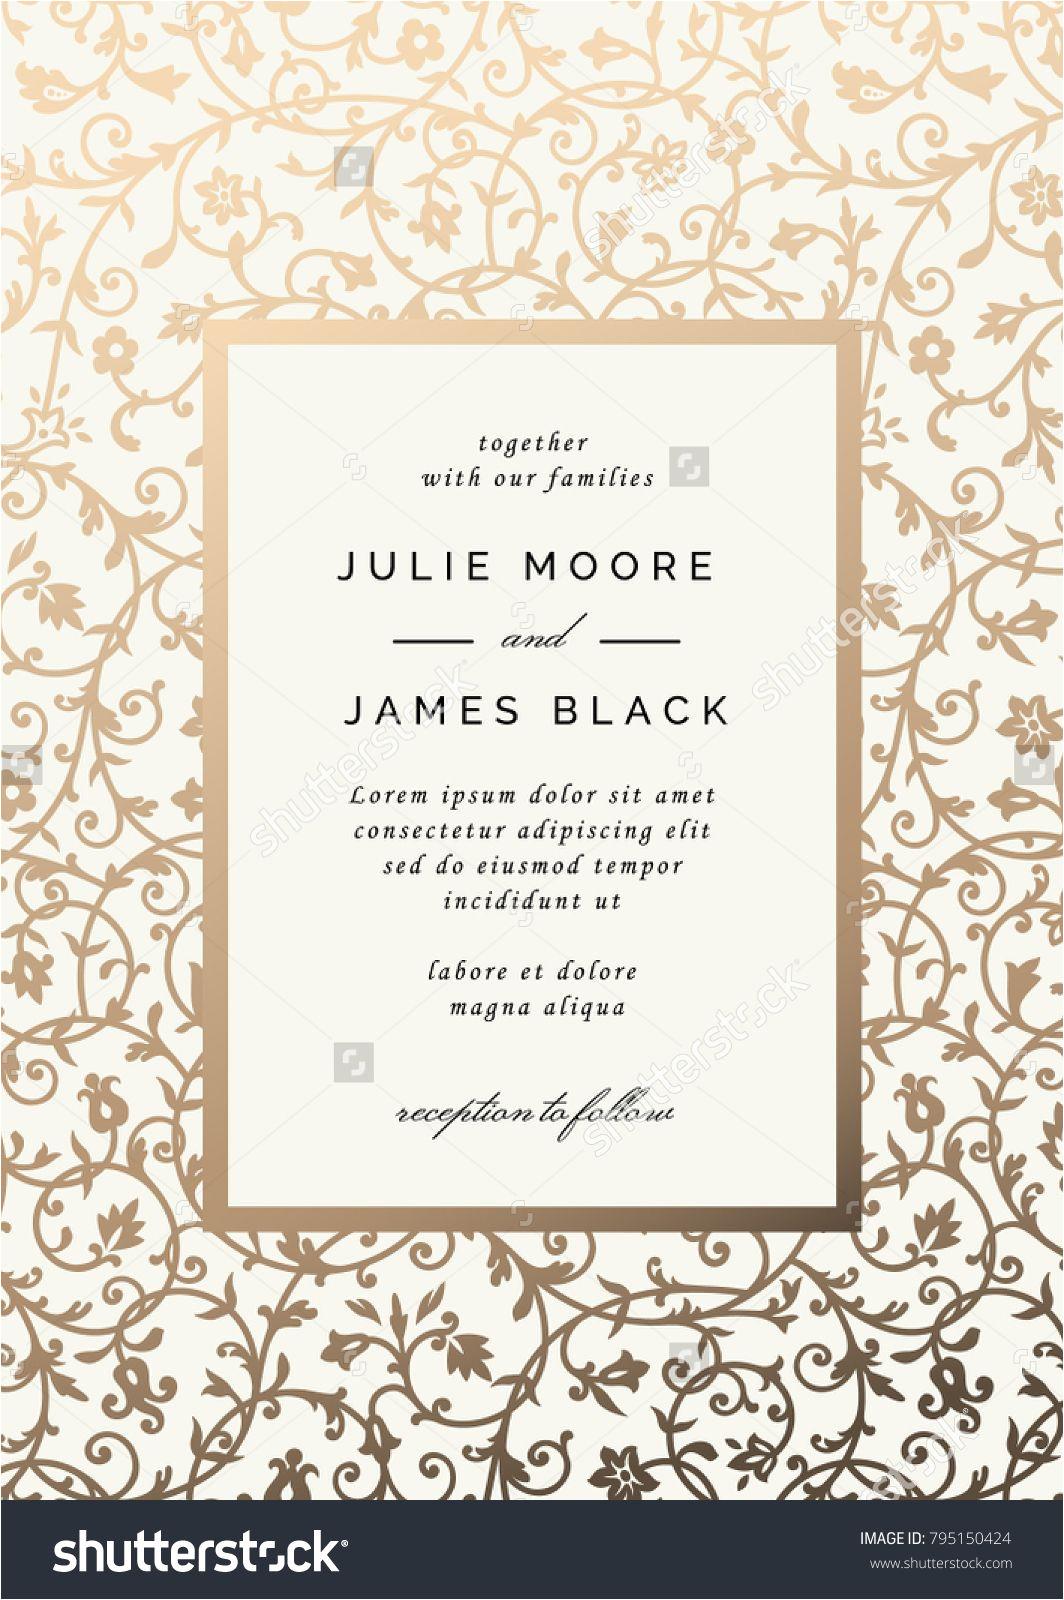 Wedding Card Background Designs Free Vintage Wedding Invitation Template with Golden Floral Backg